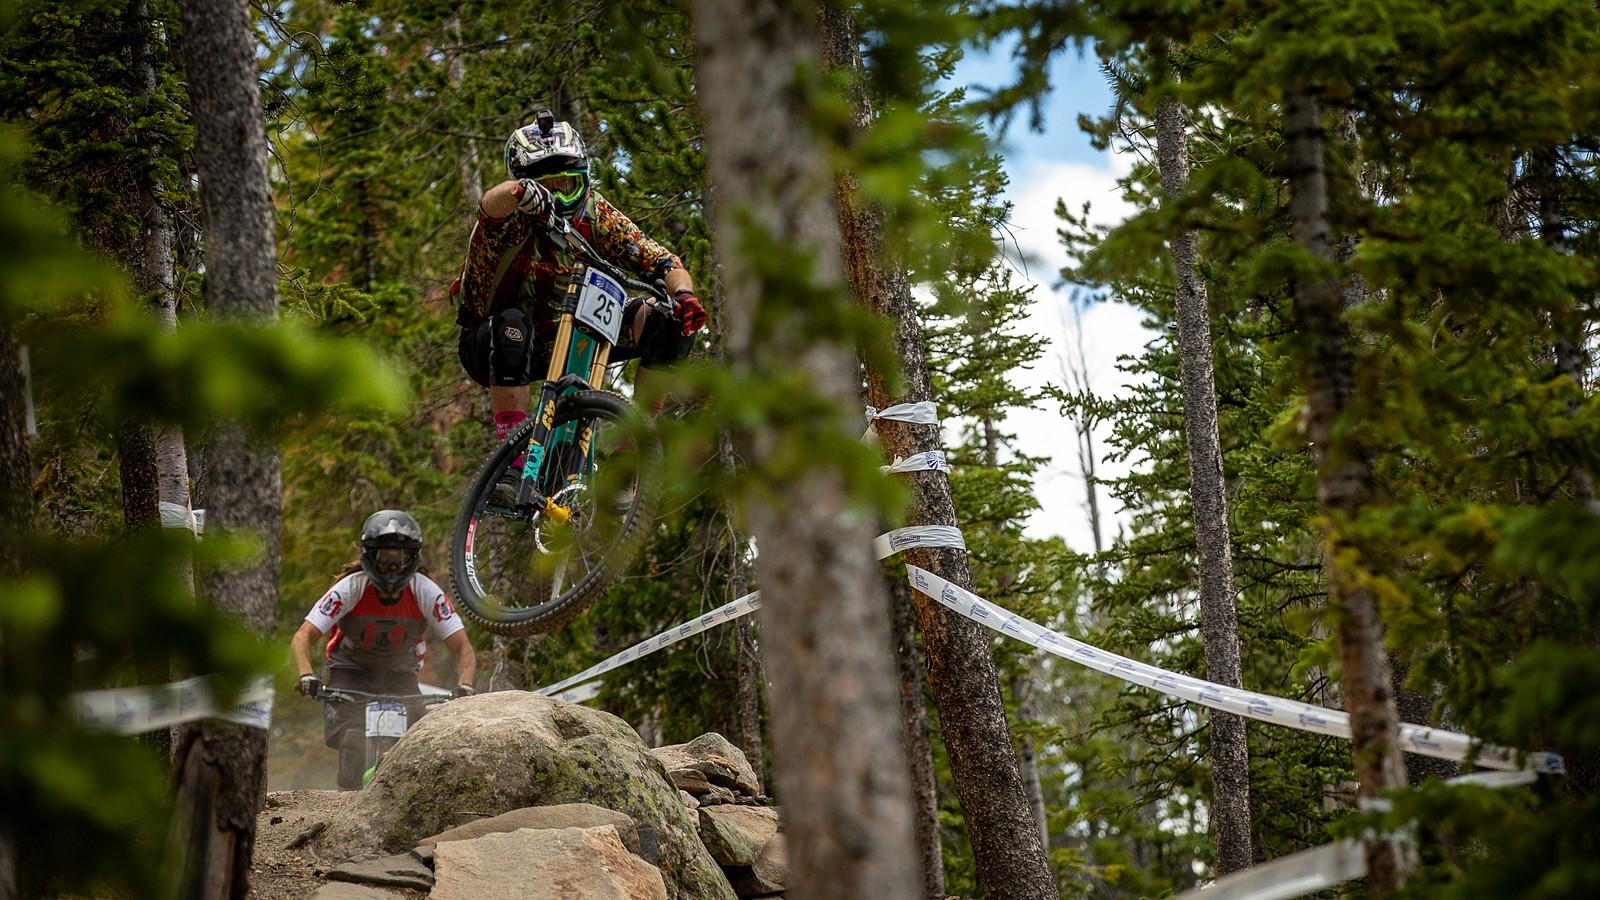 Vincent Kimber - US National Champs Downhill Photo Blast - Mountain Biking Pictures - Vital MTB